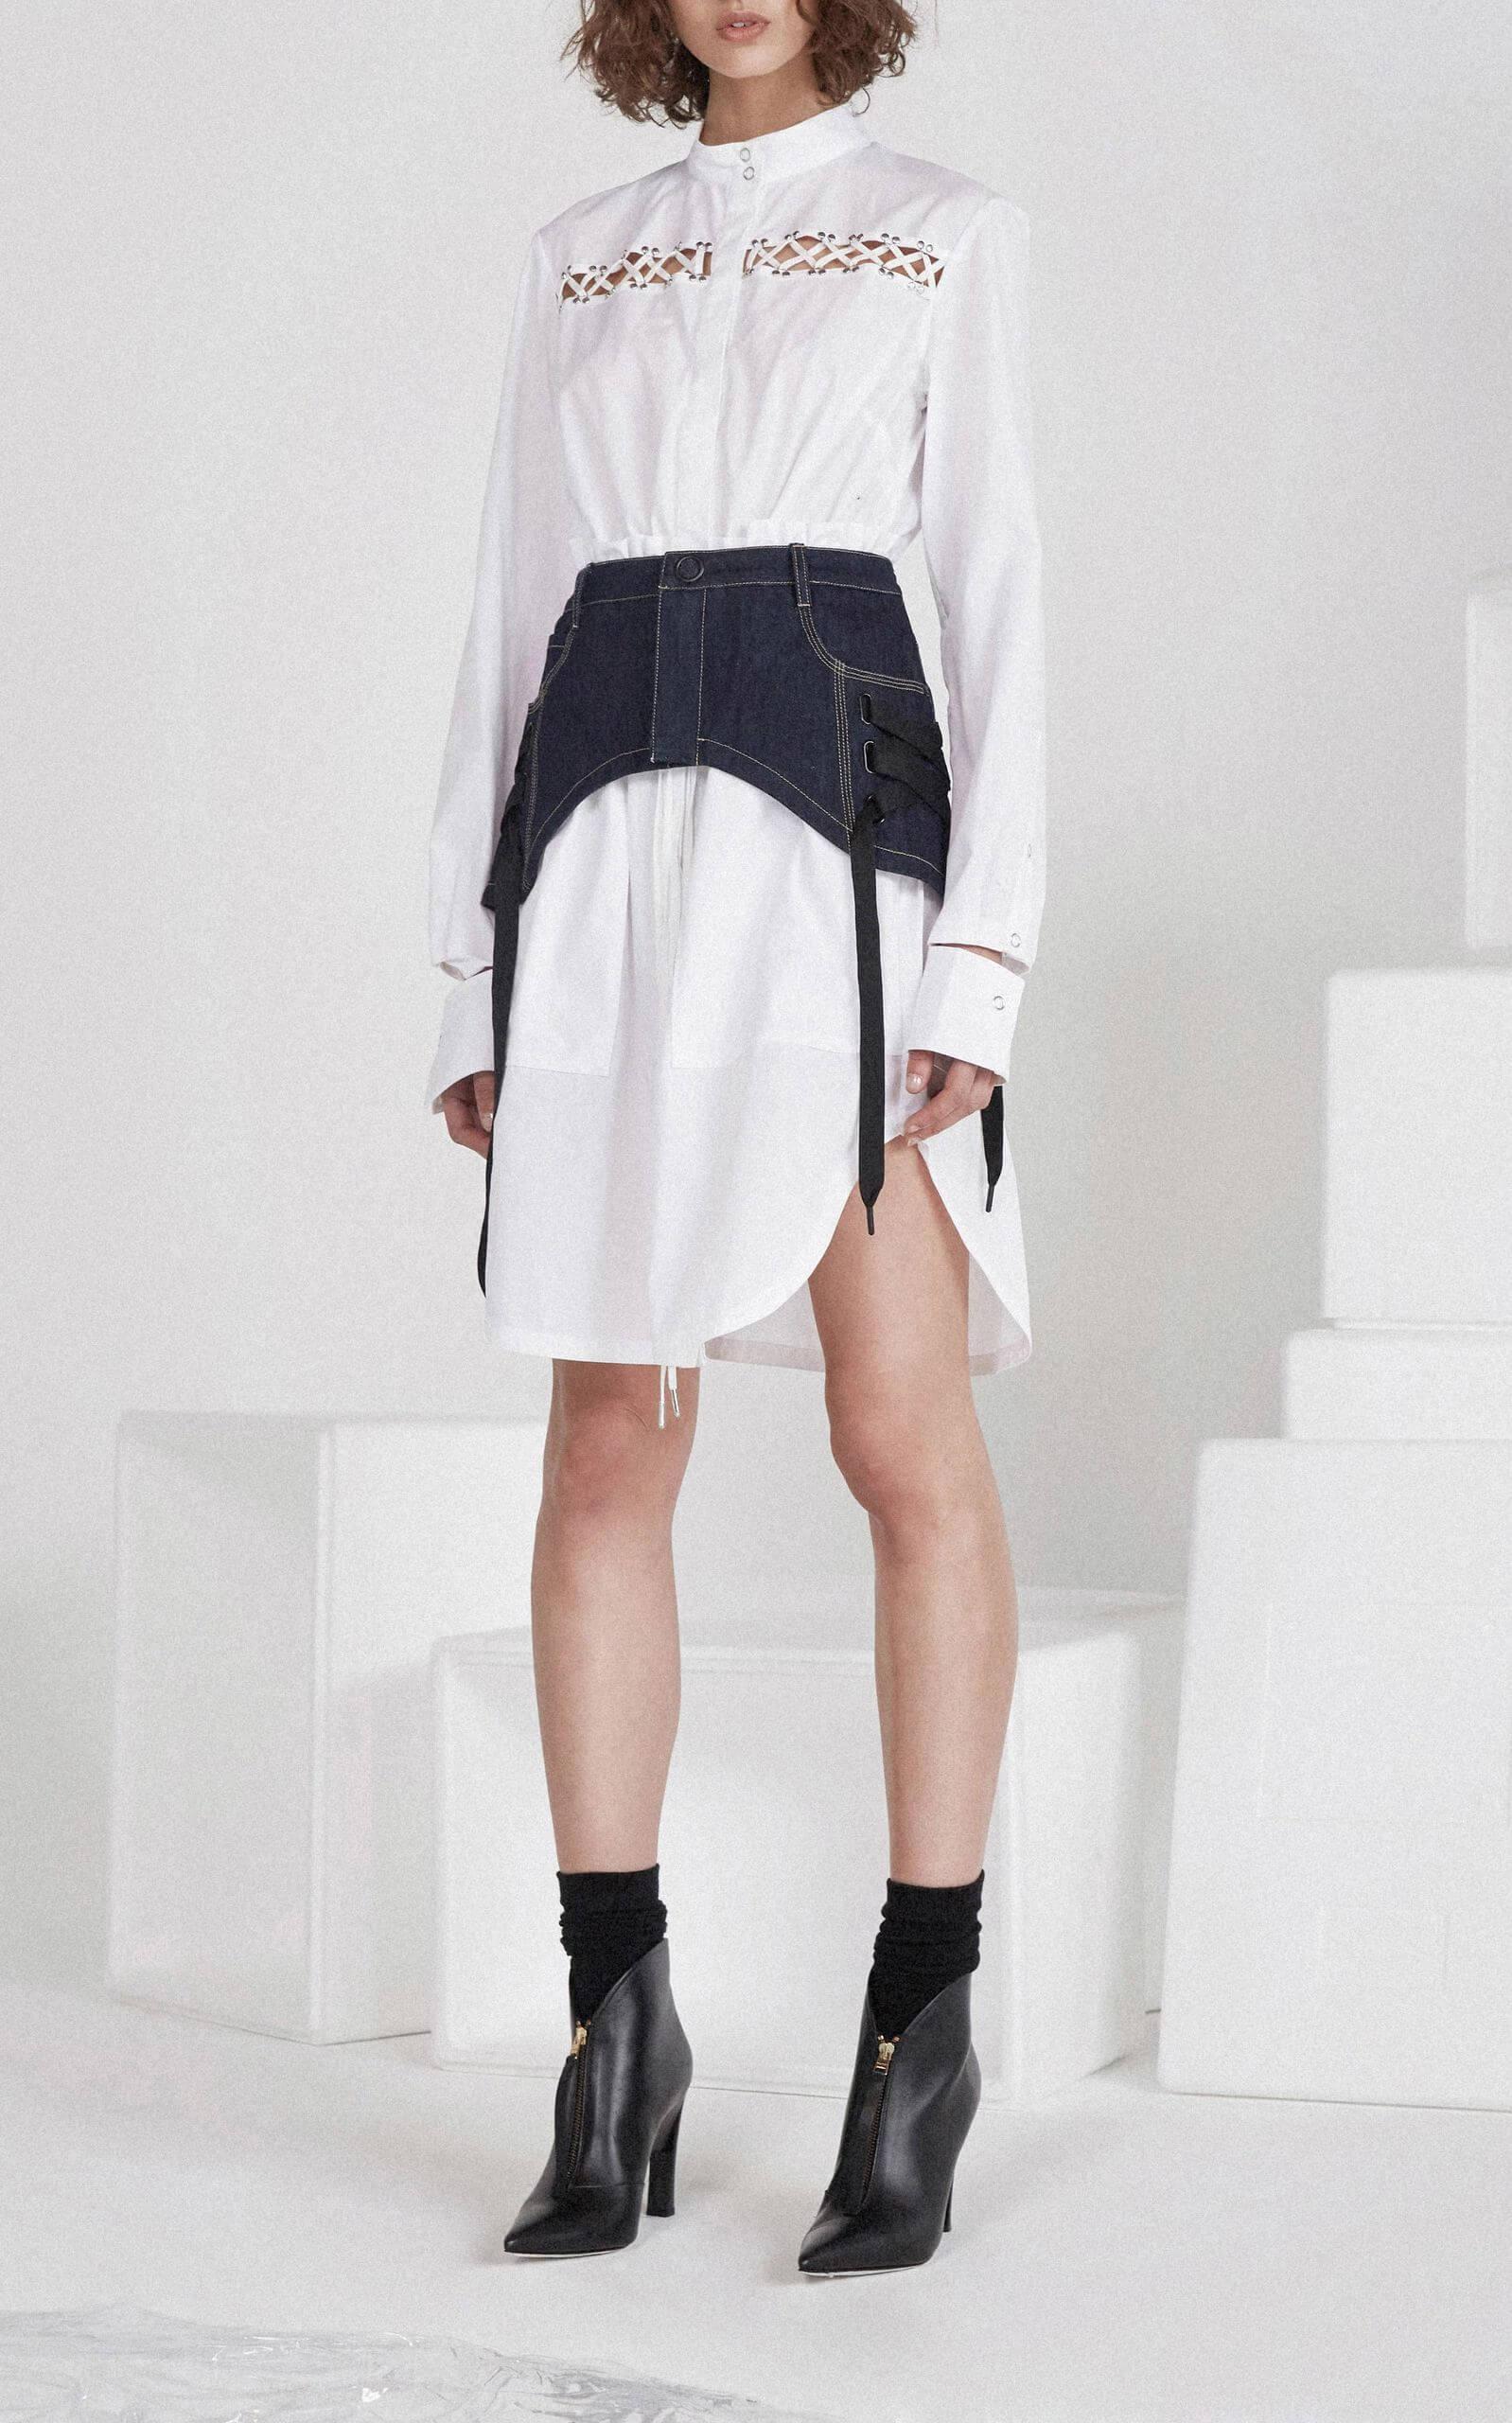 acler Saltney Dress